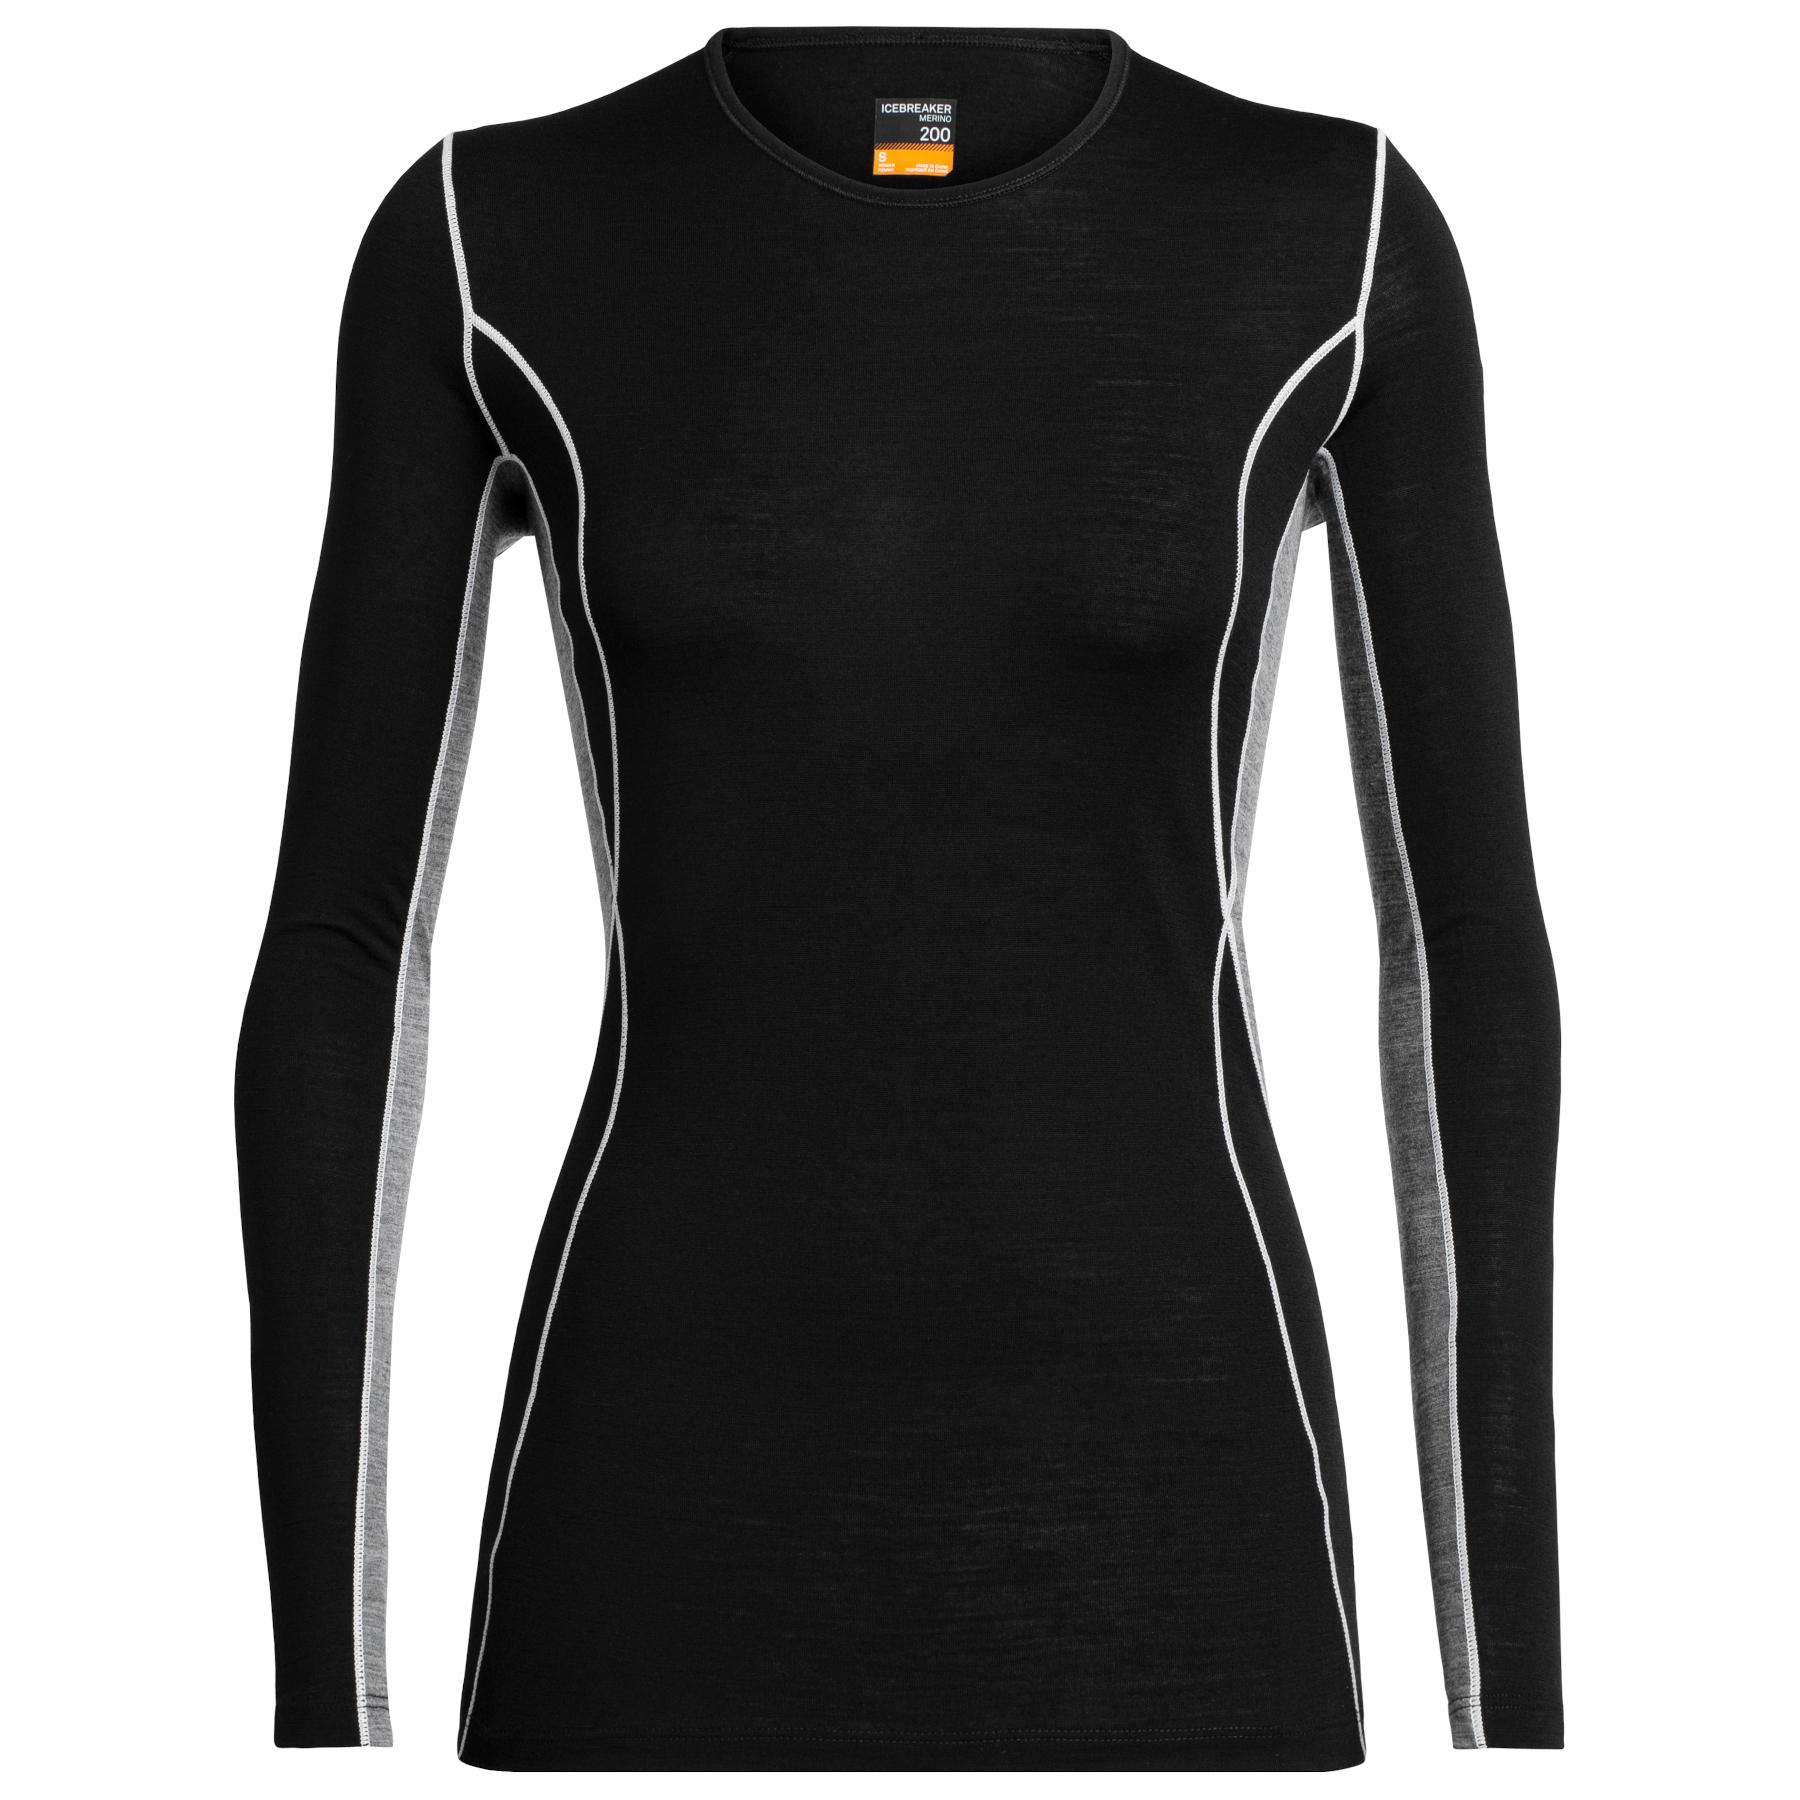 Produktbild von Icebreaker 200 Oasis Deluxe Crewe Damen Langarmshirt - Black/Gritstone HTHR